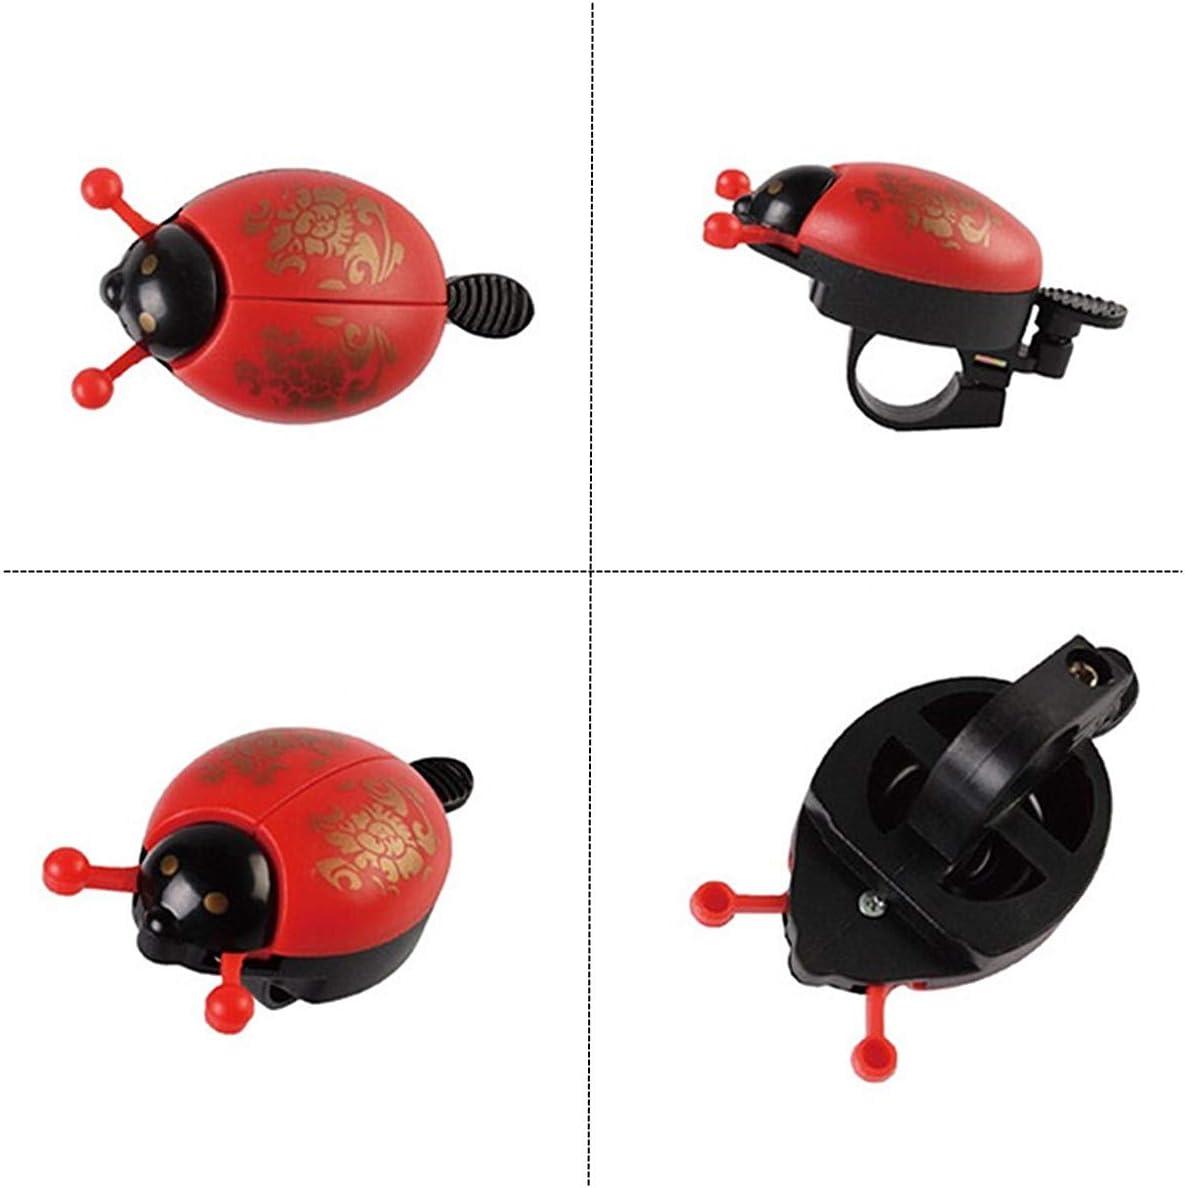 KUKU ZHEN Color Rojo Sonido Alto y Claro dise/ño de Mariquita Timbre de Bicicleta para ni/ños